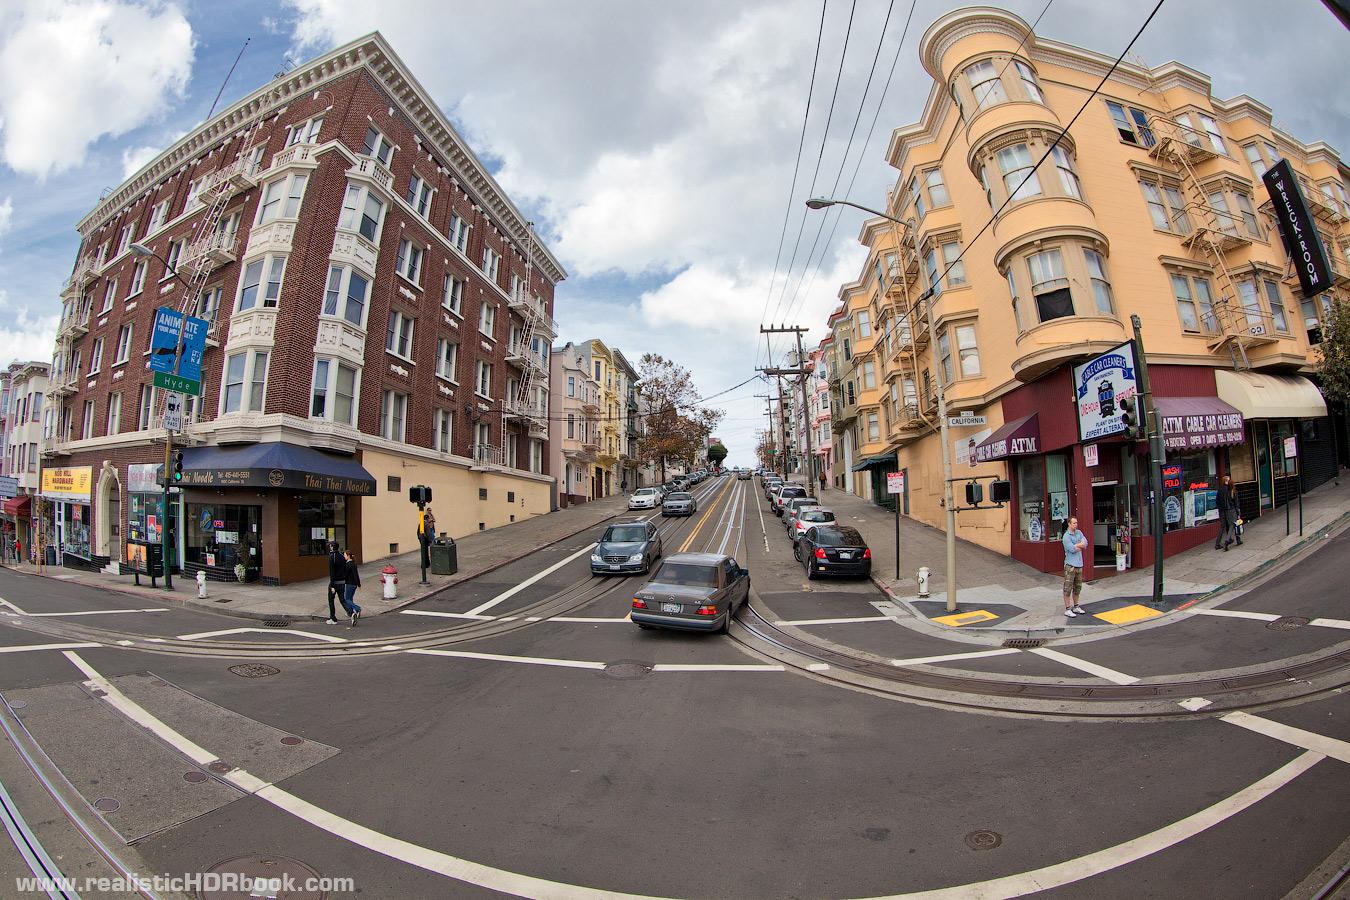 Photo: Streets of San Francisco by Alex Koloskov. www.realisticHDRbook.com